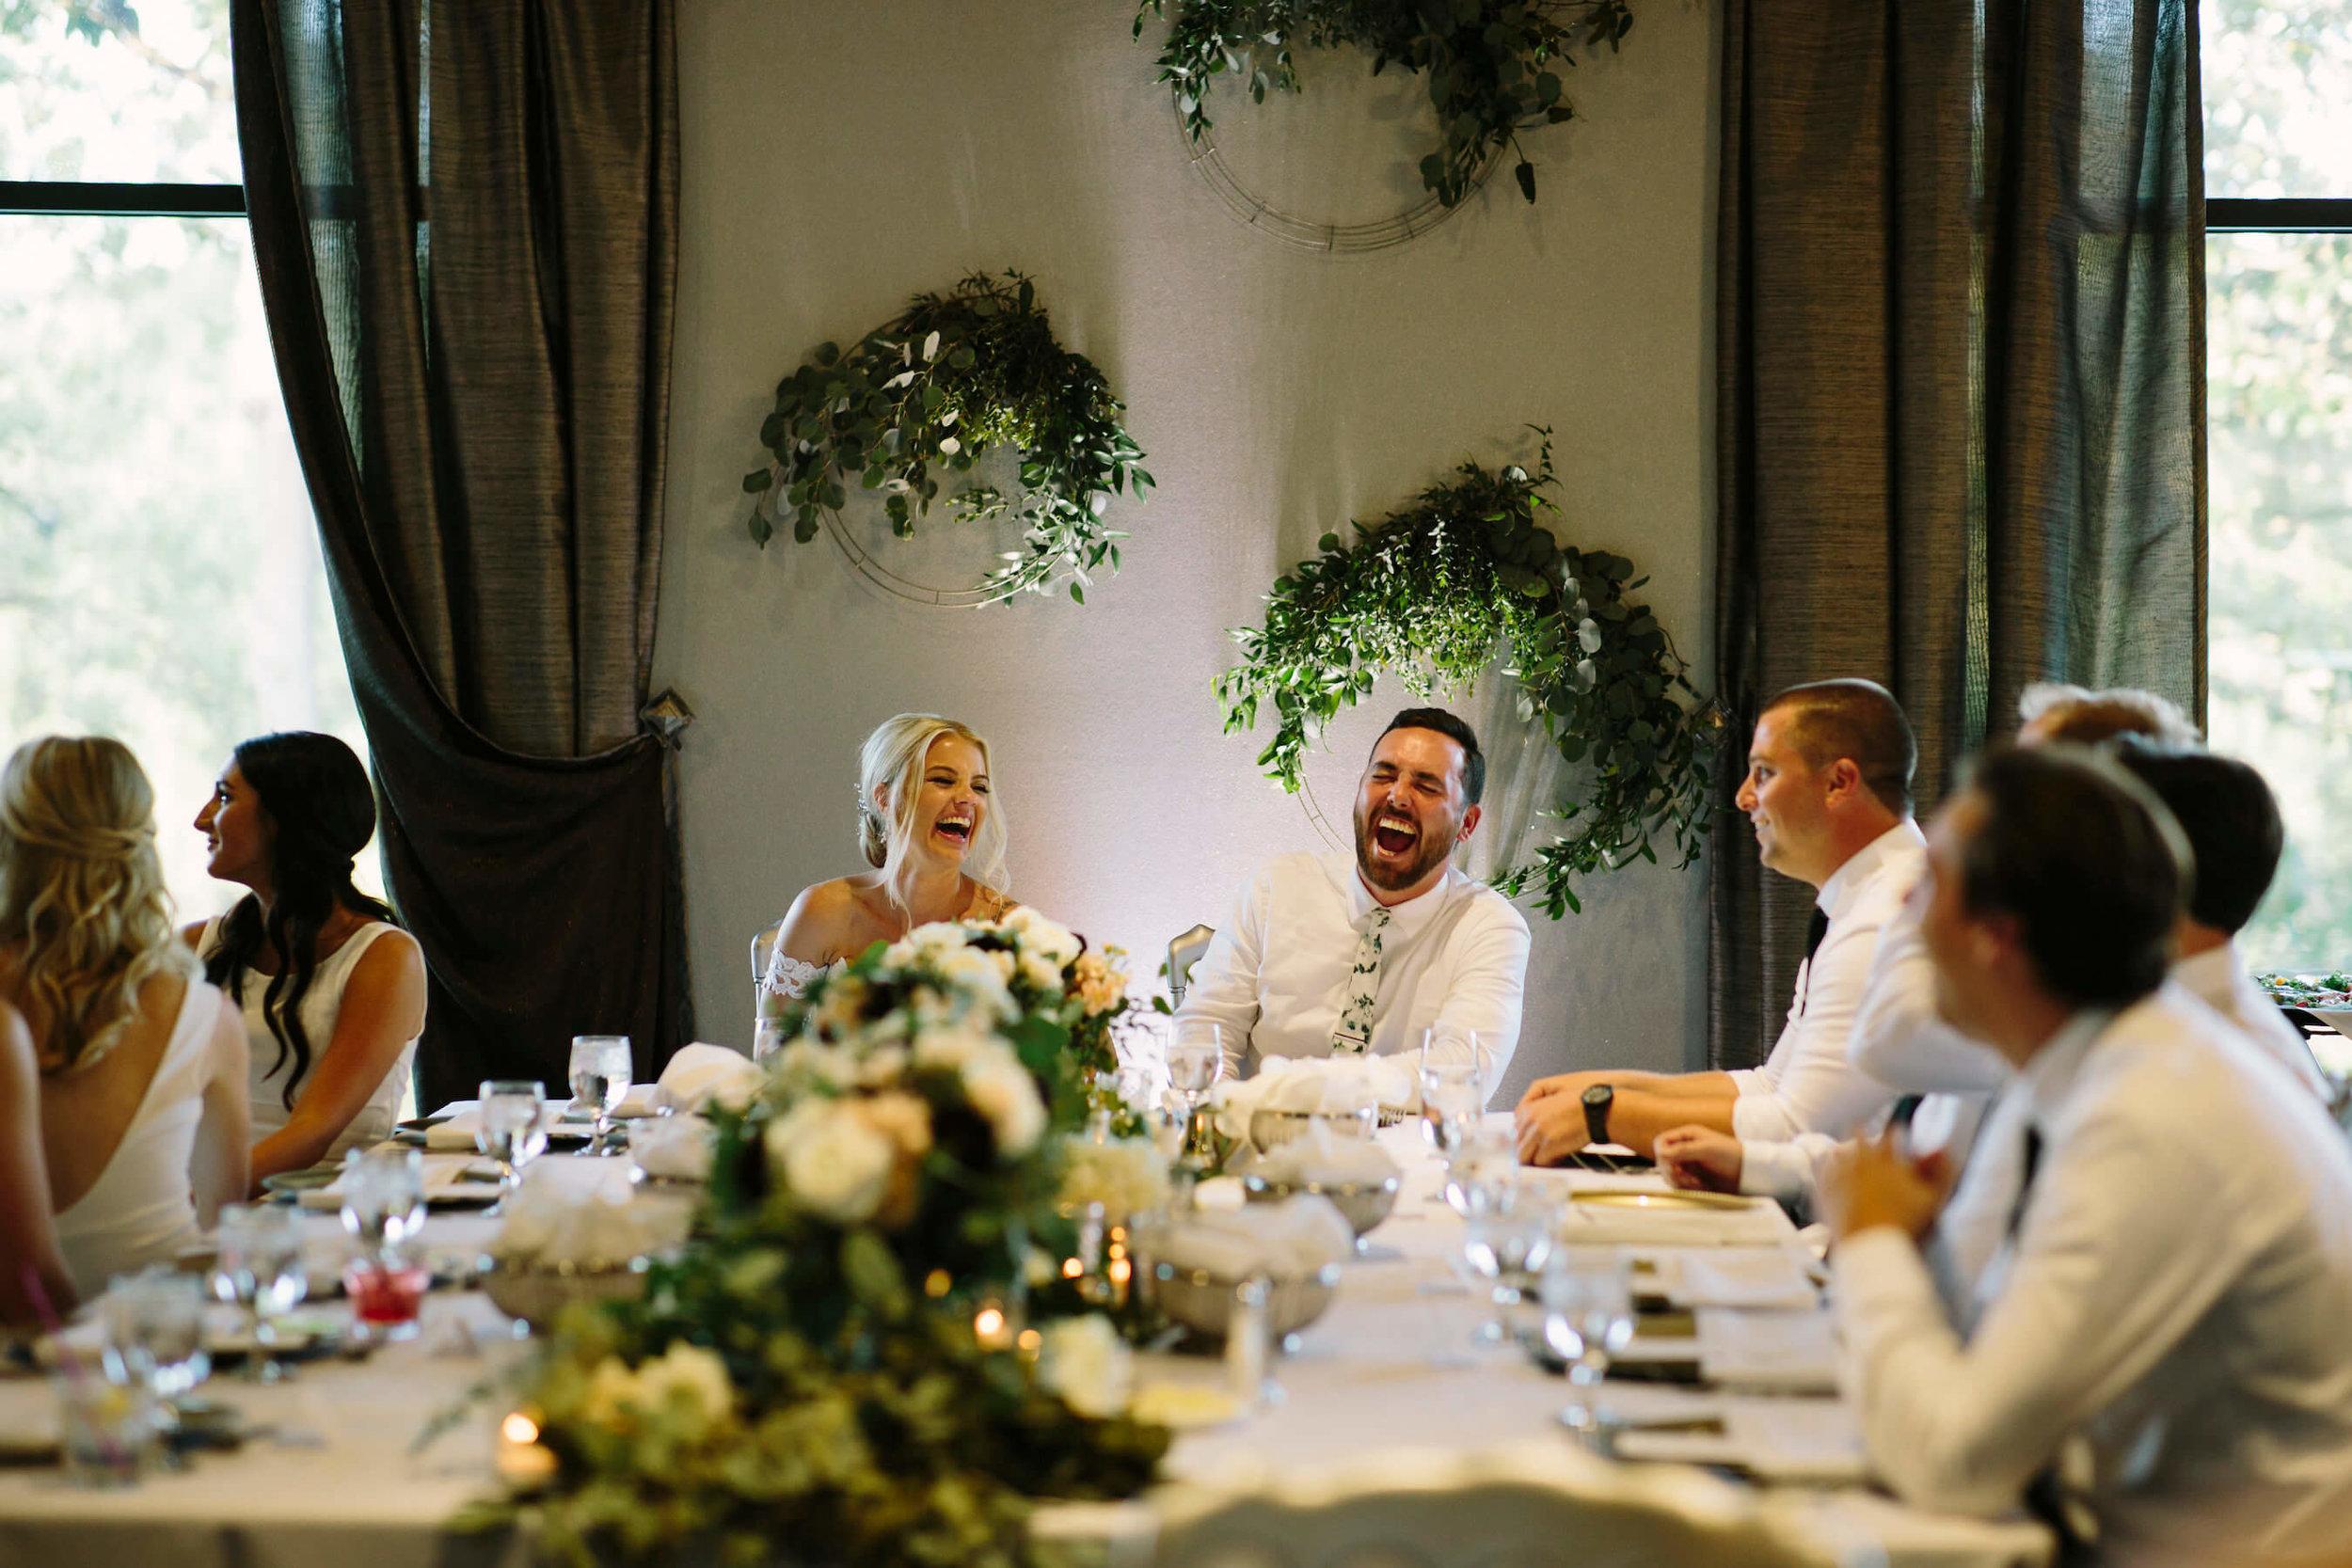 engle-olson-april-cj-wedding-jessica-holleque-15.jpg